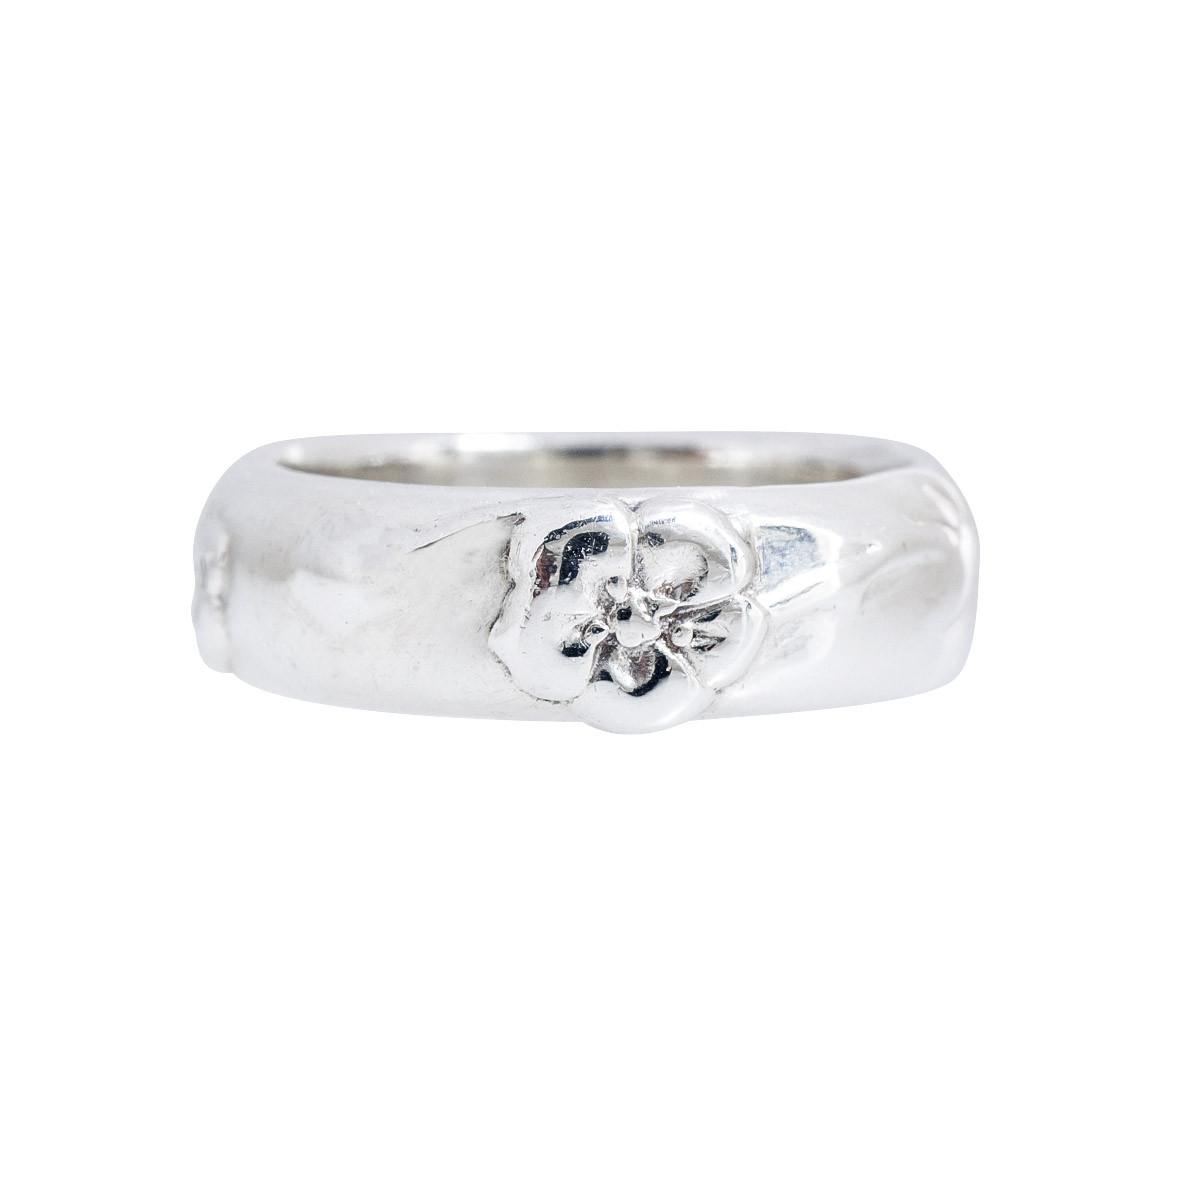 Vintage Tiffany & Co. Nature Rose Ring